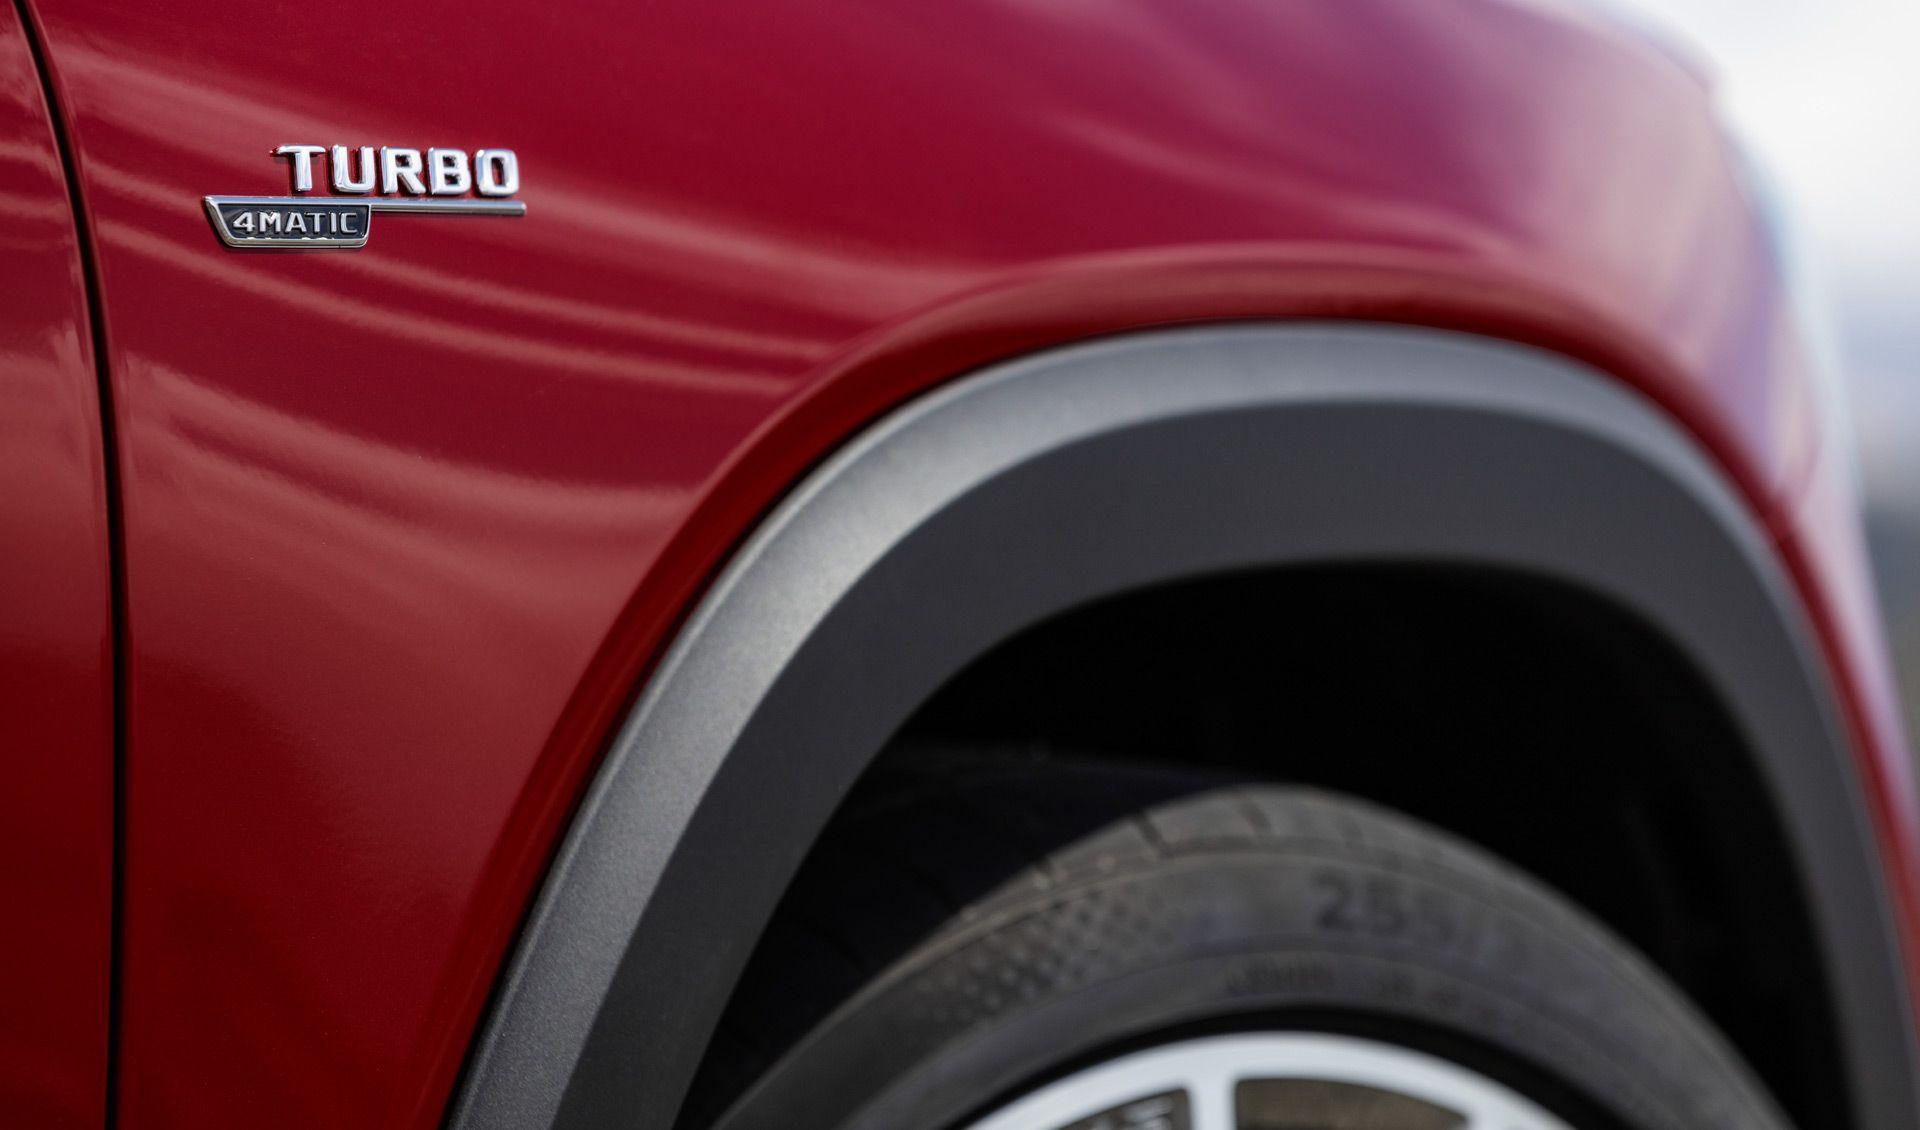 Mercedes представив гарячий кросовер AMG GLB 35 2020 модельного року